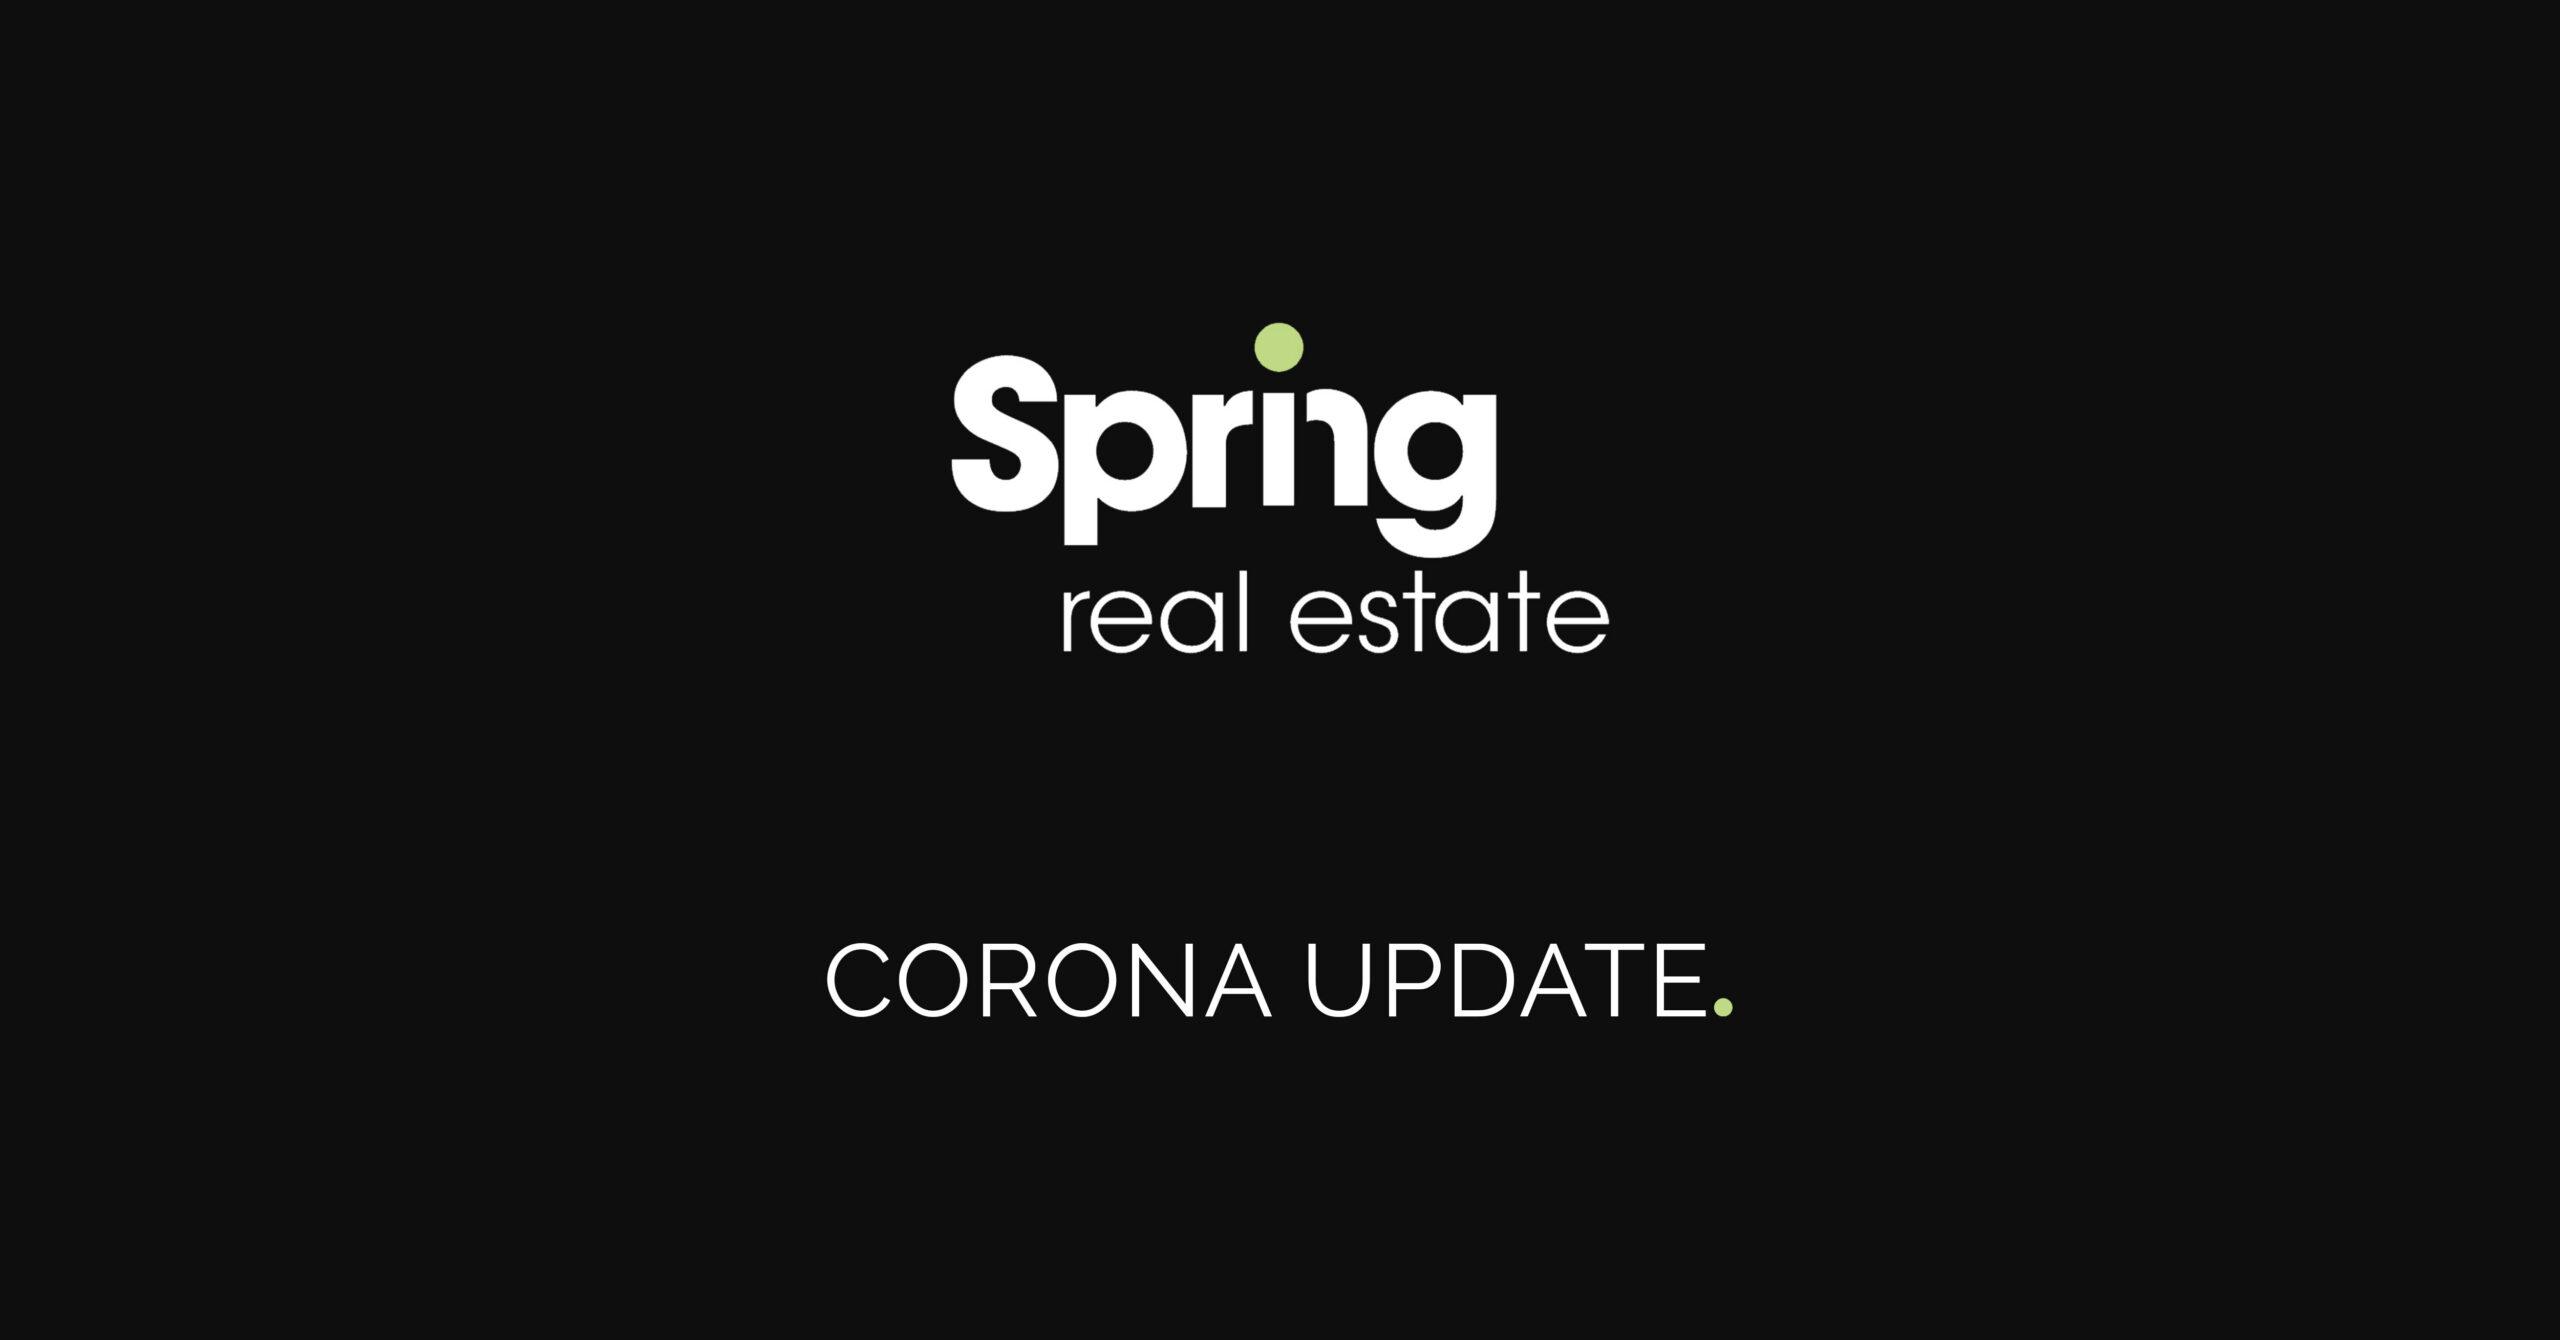 Corona Update Spring Real Estate